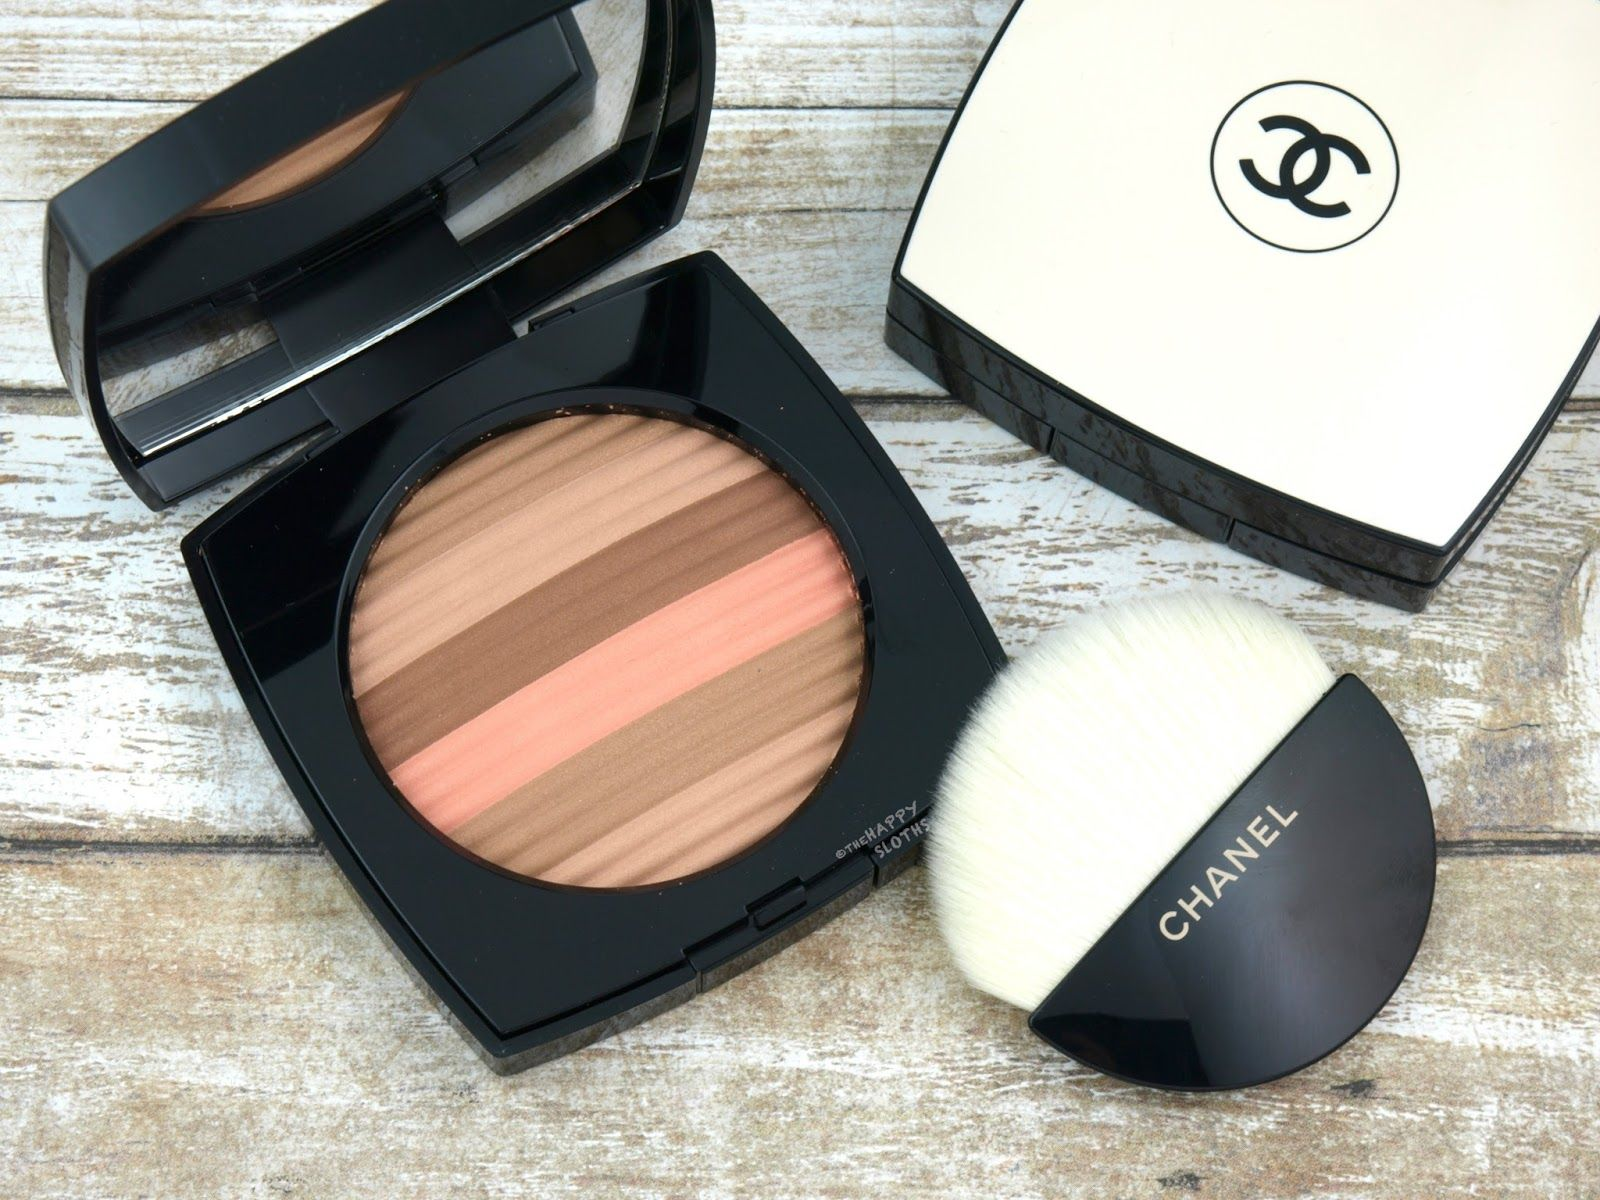 02a114a124e Chanel Les Beiges Healthy Glow Luminous Multi-Color Powder in